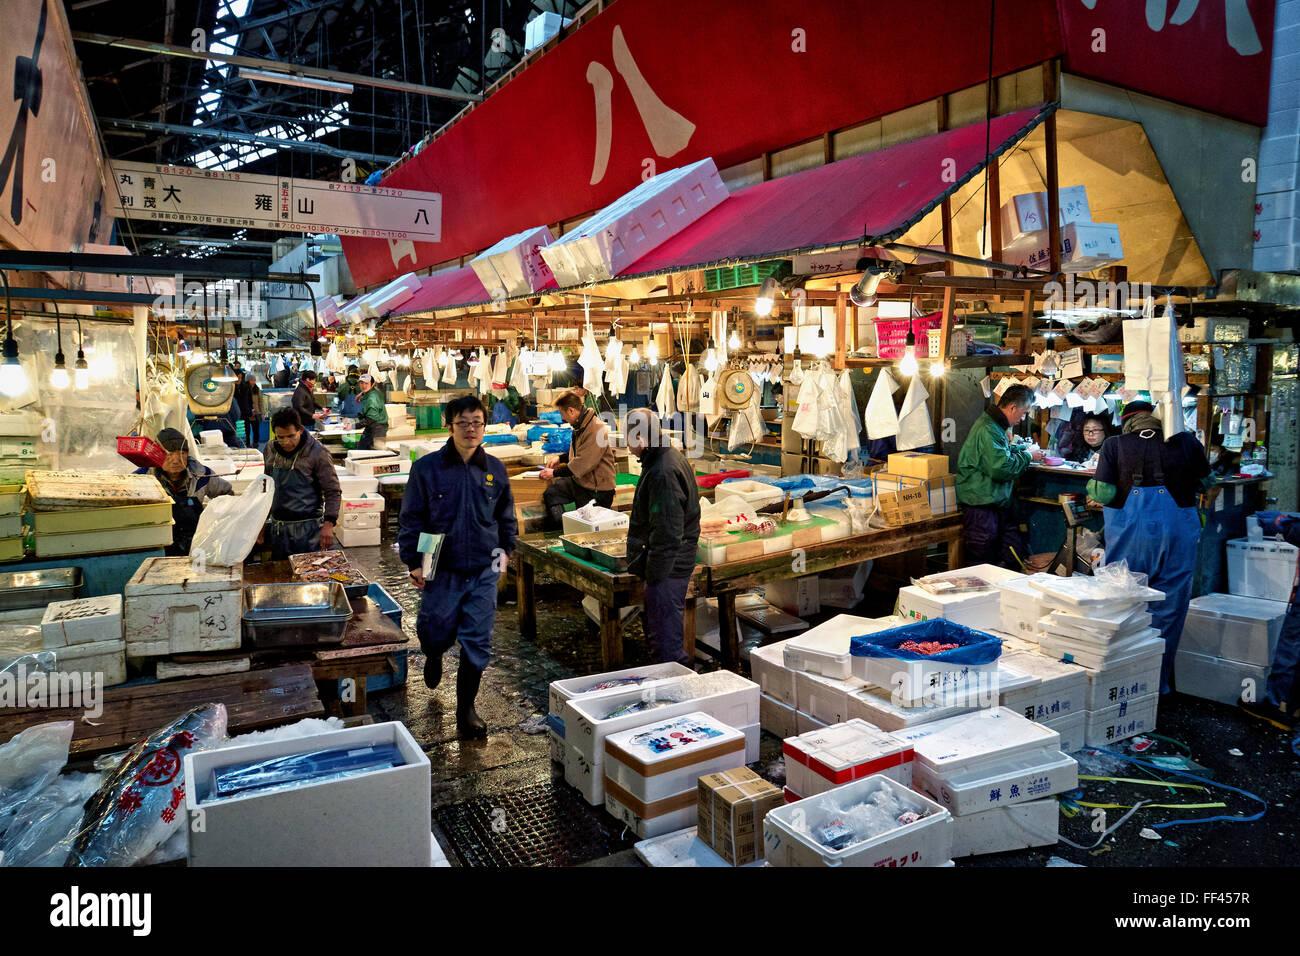 Giappone, isola di Honshu, Kanto, Tokyo, del mercato Tsukiji Immagini Stock